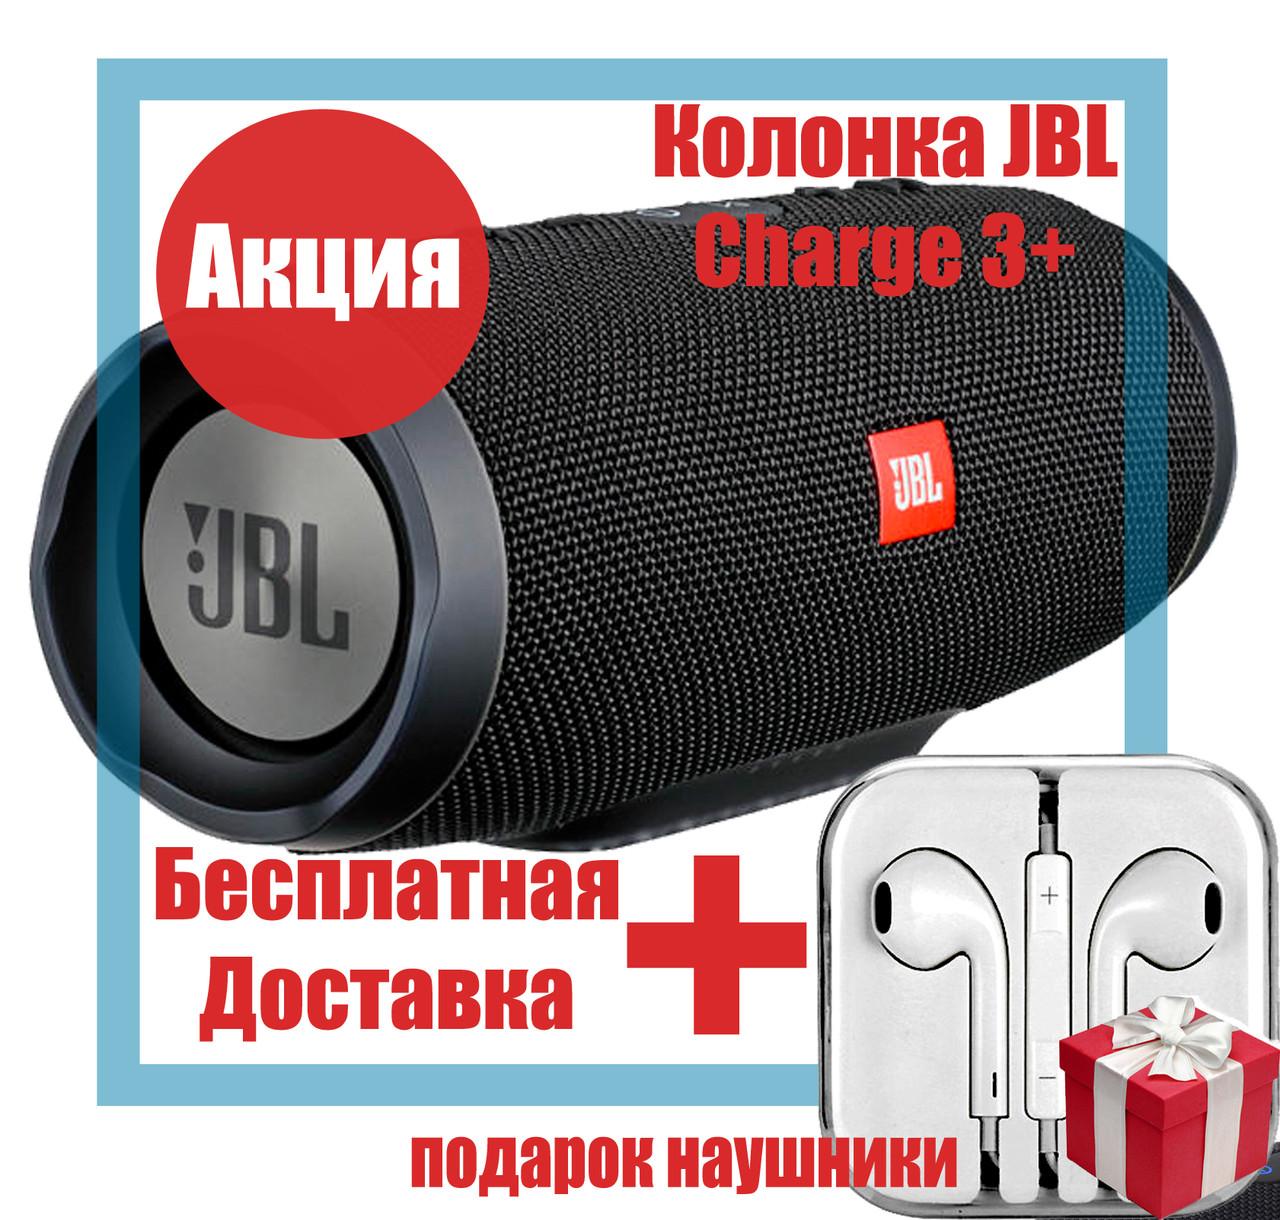 Портативная Bluetooth колонка JBL Charge3+ влагозащита, microSD, зарядка телефона 20W QualitiReplica